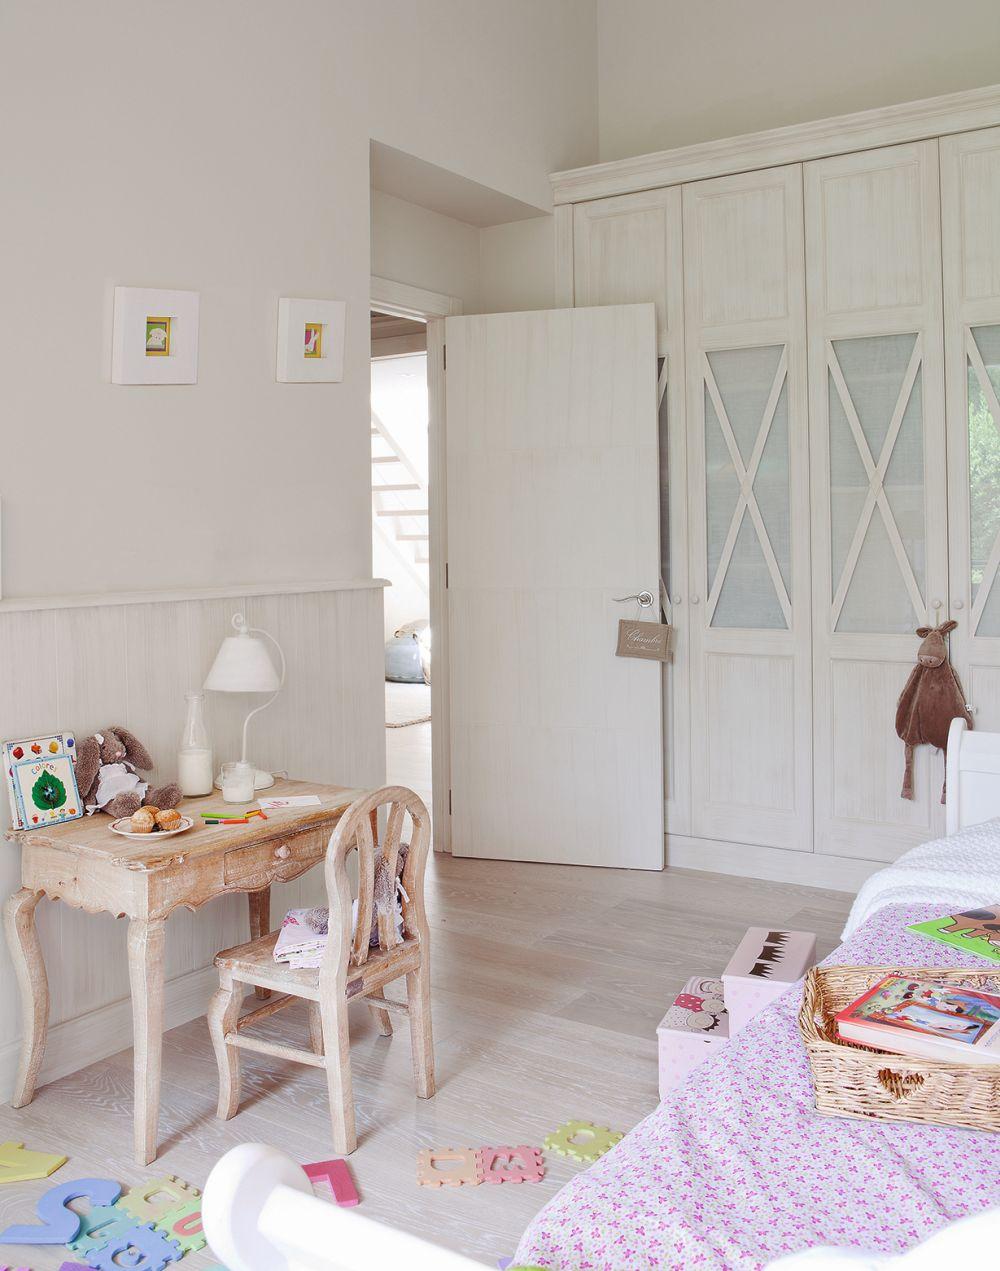 adelaparvu.com despre casa cu interior romantic modern, decorator Asun Anto, arhitect Fernando Agusti (17)